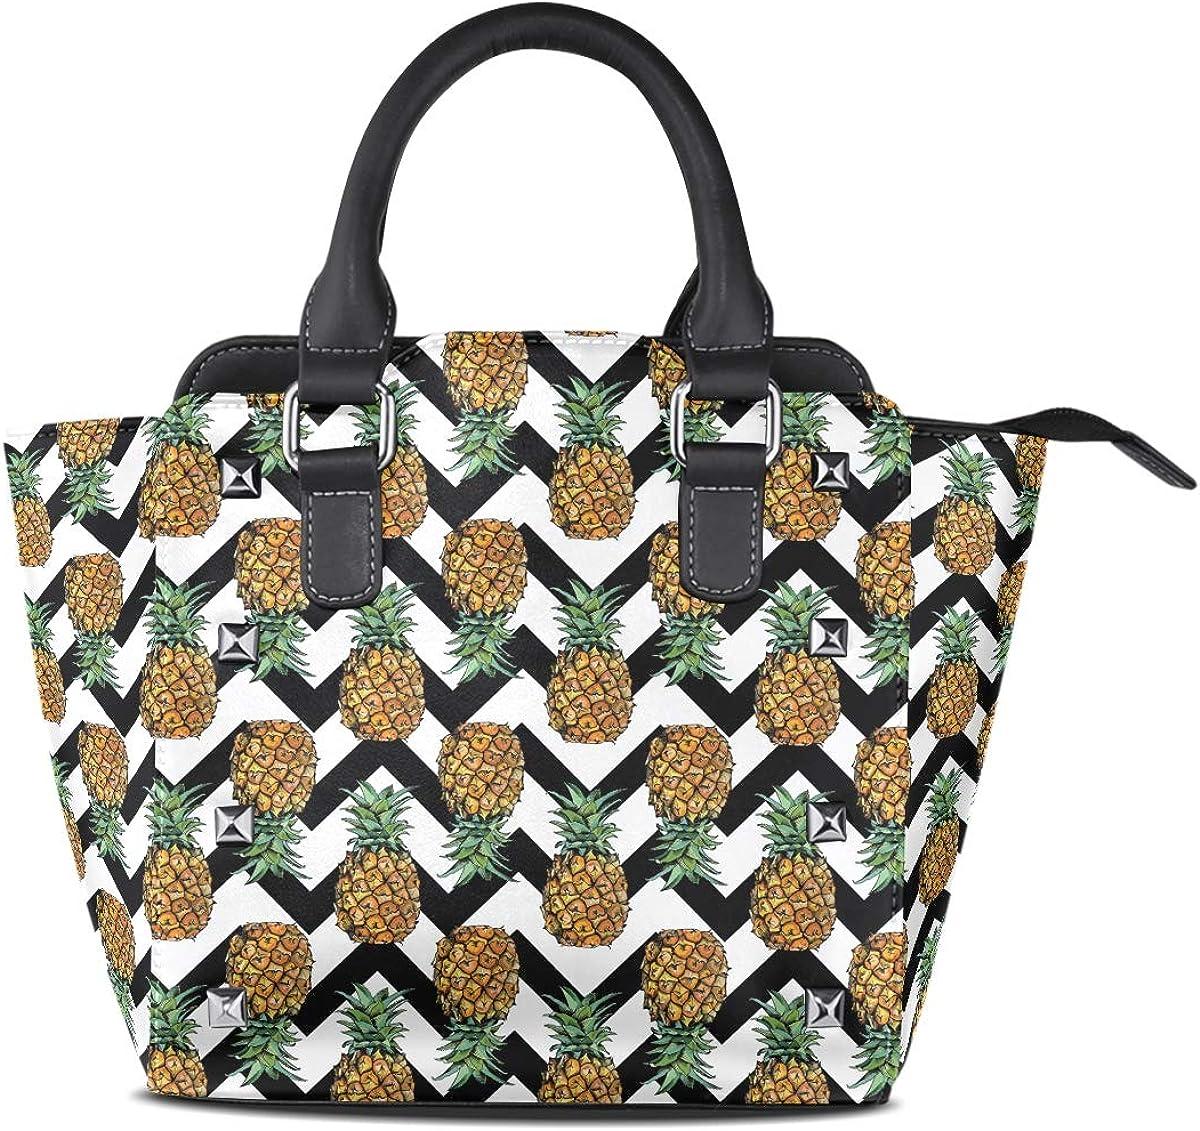 Leather Flower Halloween Sugar Skull Rivet Handbags Tote Bag Shoulder Satchel for Women Girls